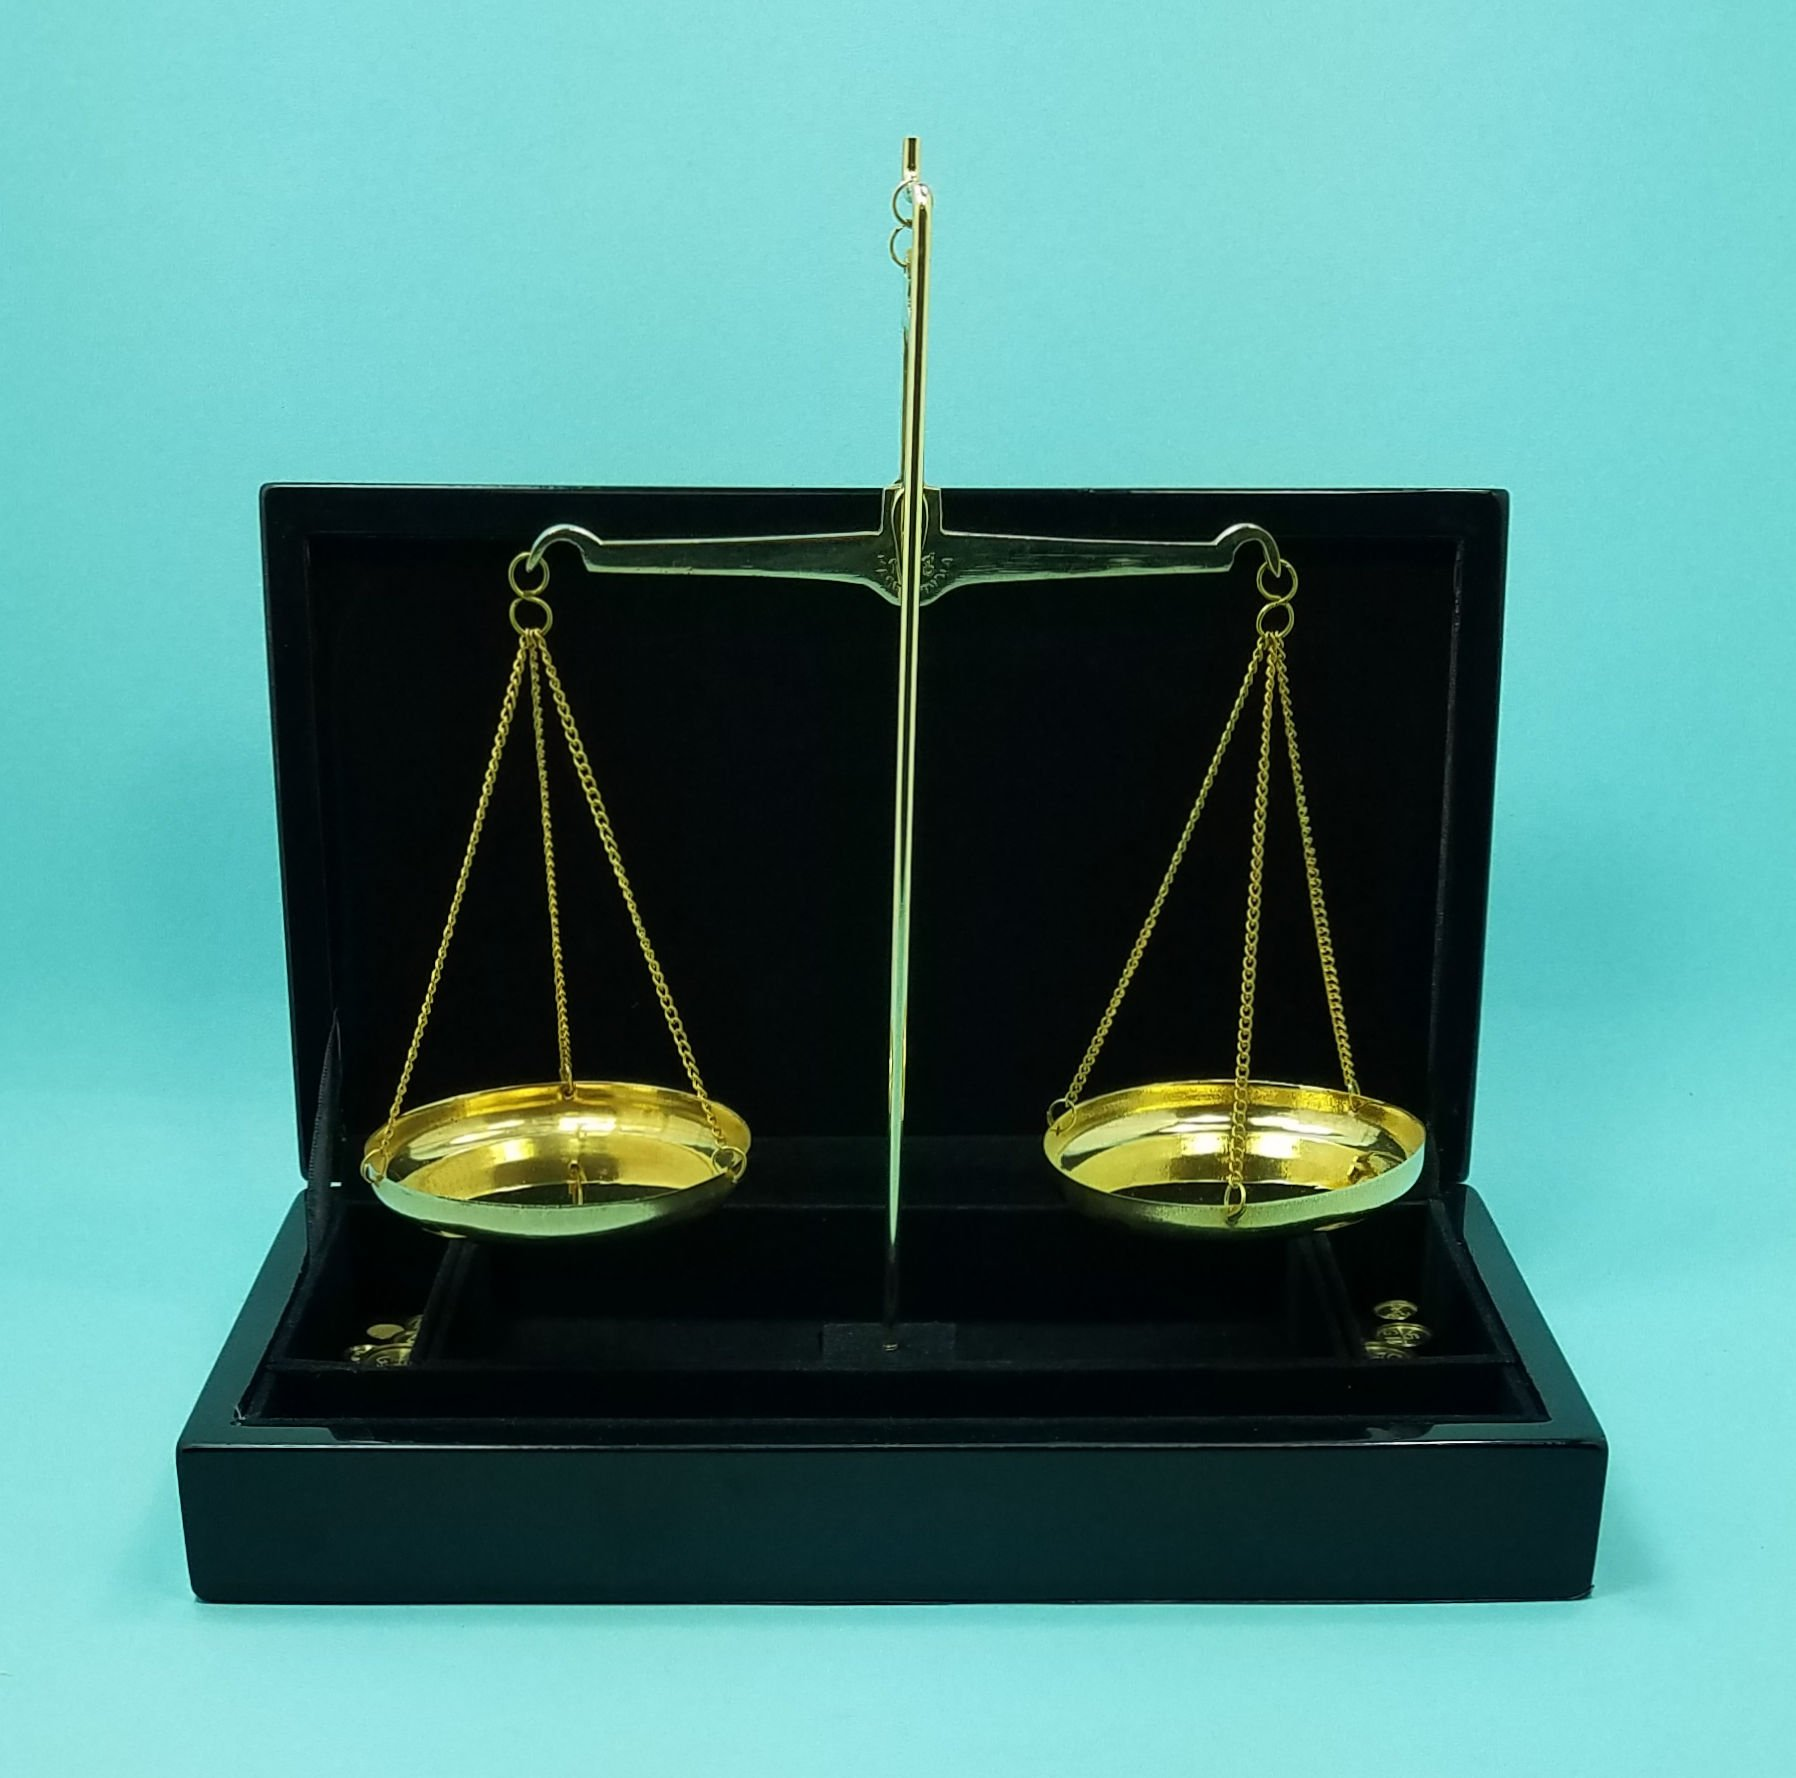 Executive 100-Gram Capacity Balance Scale in Black Piano Finish Case